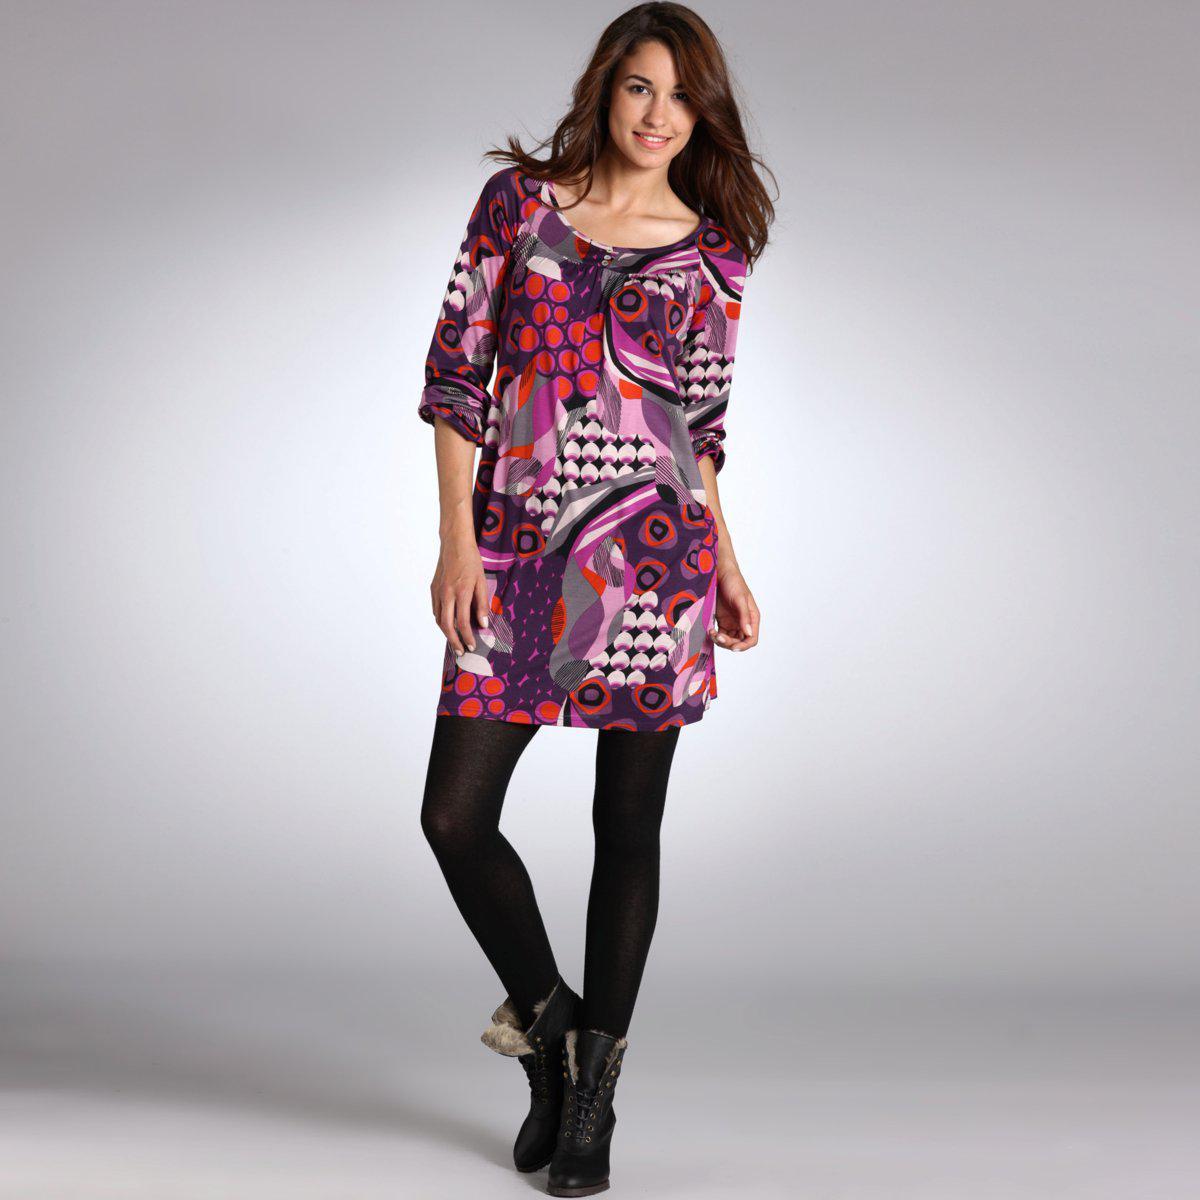 bradyna foremata 238 - Βραδυνα Φορεματα LaRedoute Φθινόπωρο 2011 Κωδ. 324223288